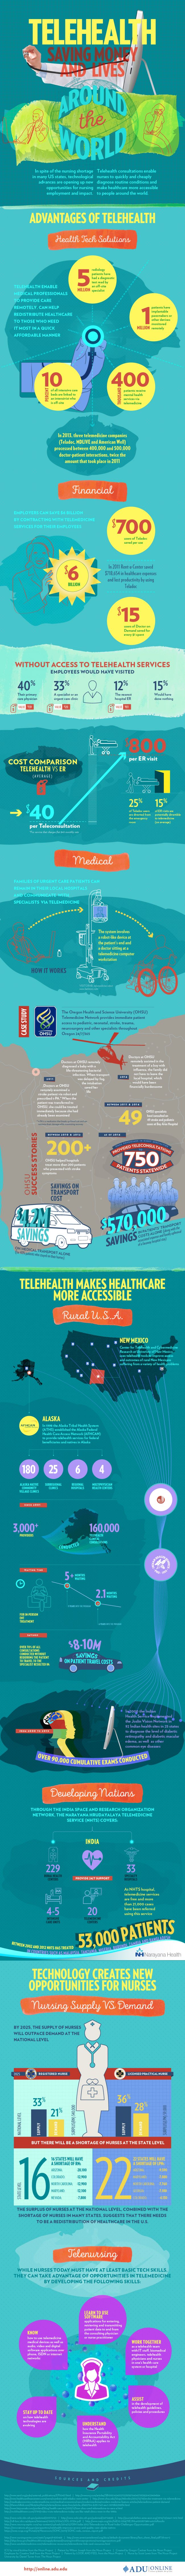 Telehealth Saving Money And Lives Around The World #Infographic #Health #Travel